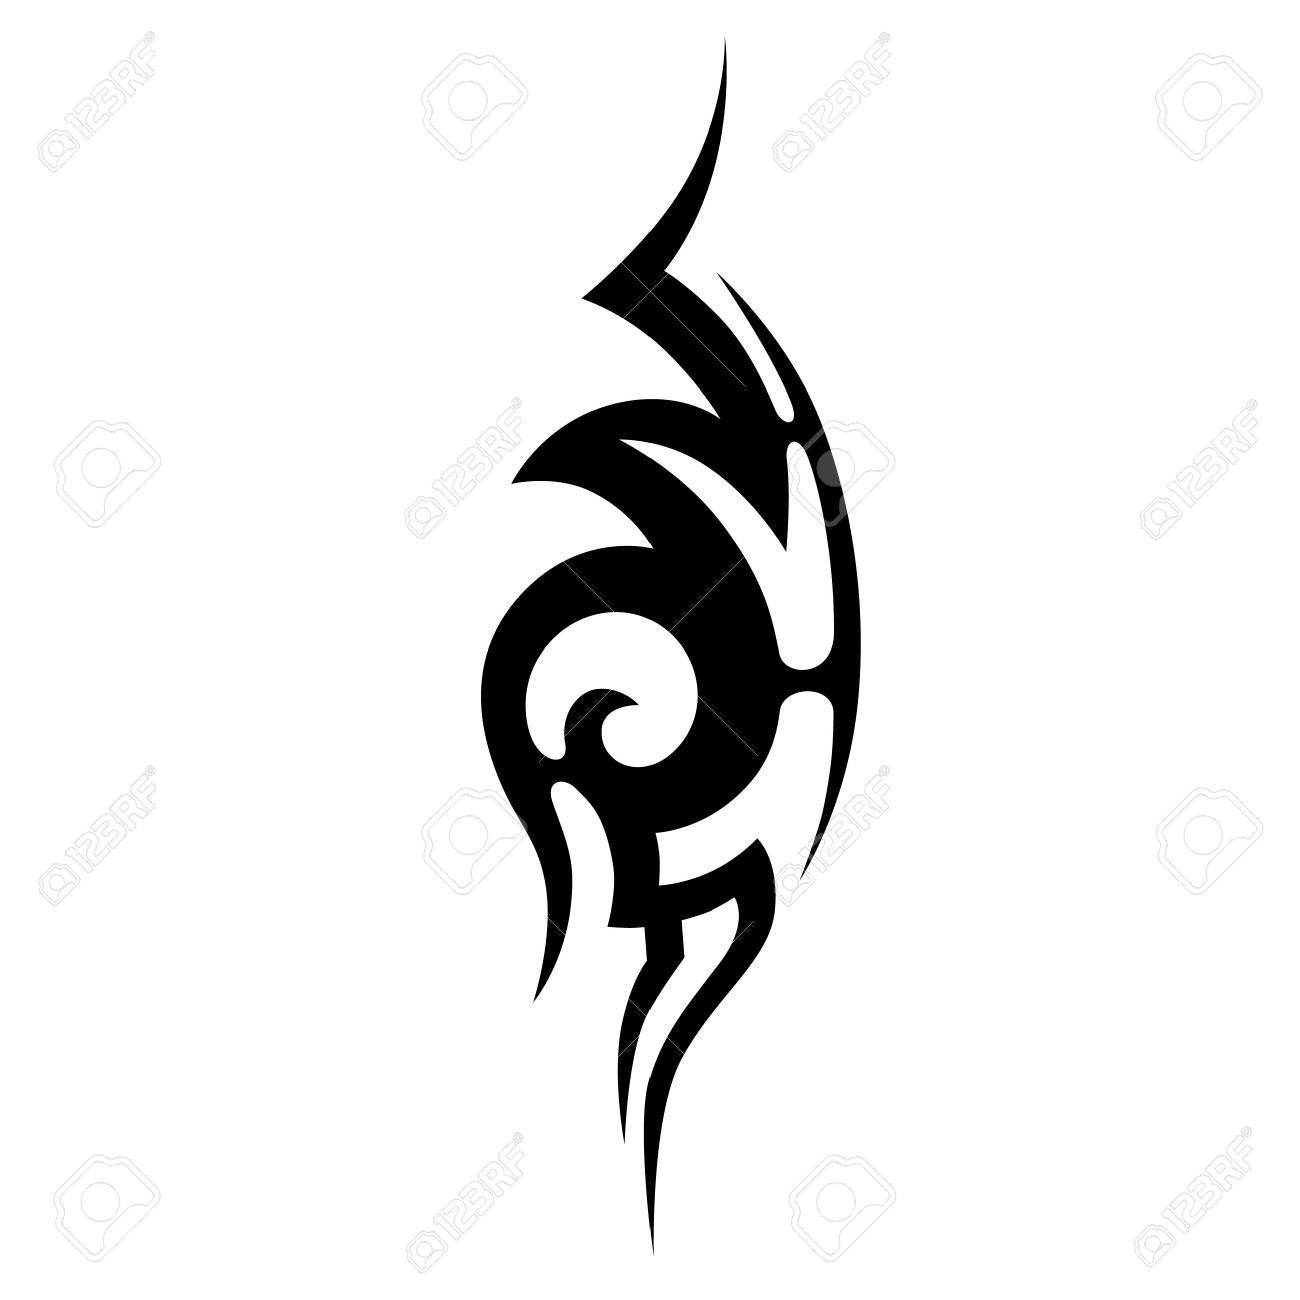 Tatuajes Tribales Vintage Tatuaje Tribal Del Arte Dibujo Vectorial